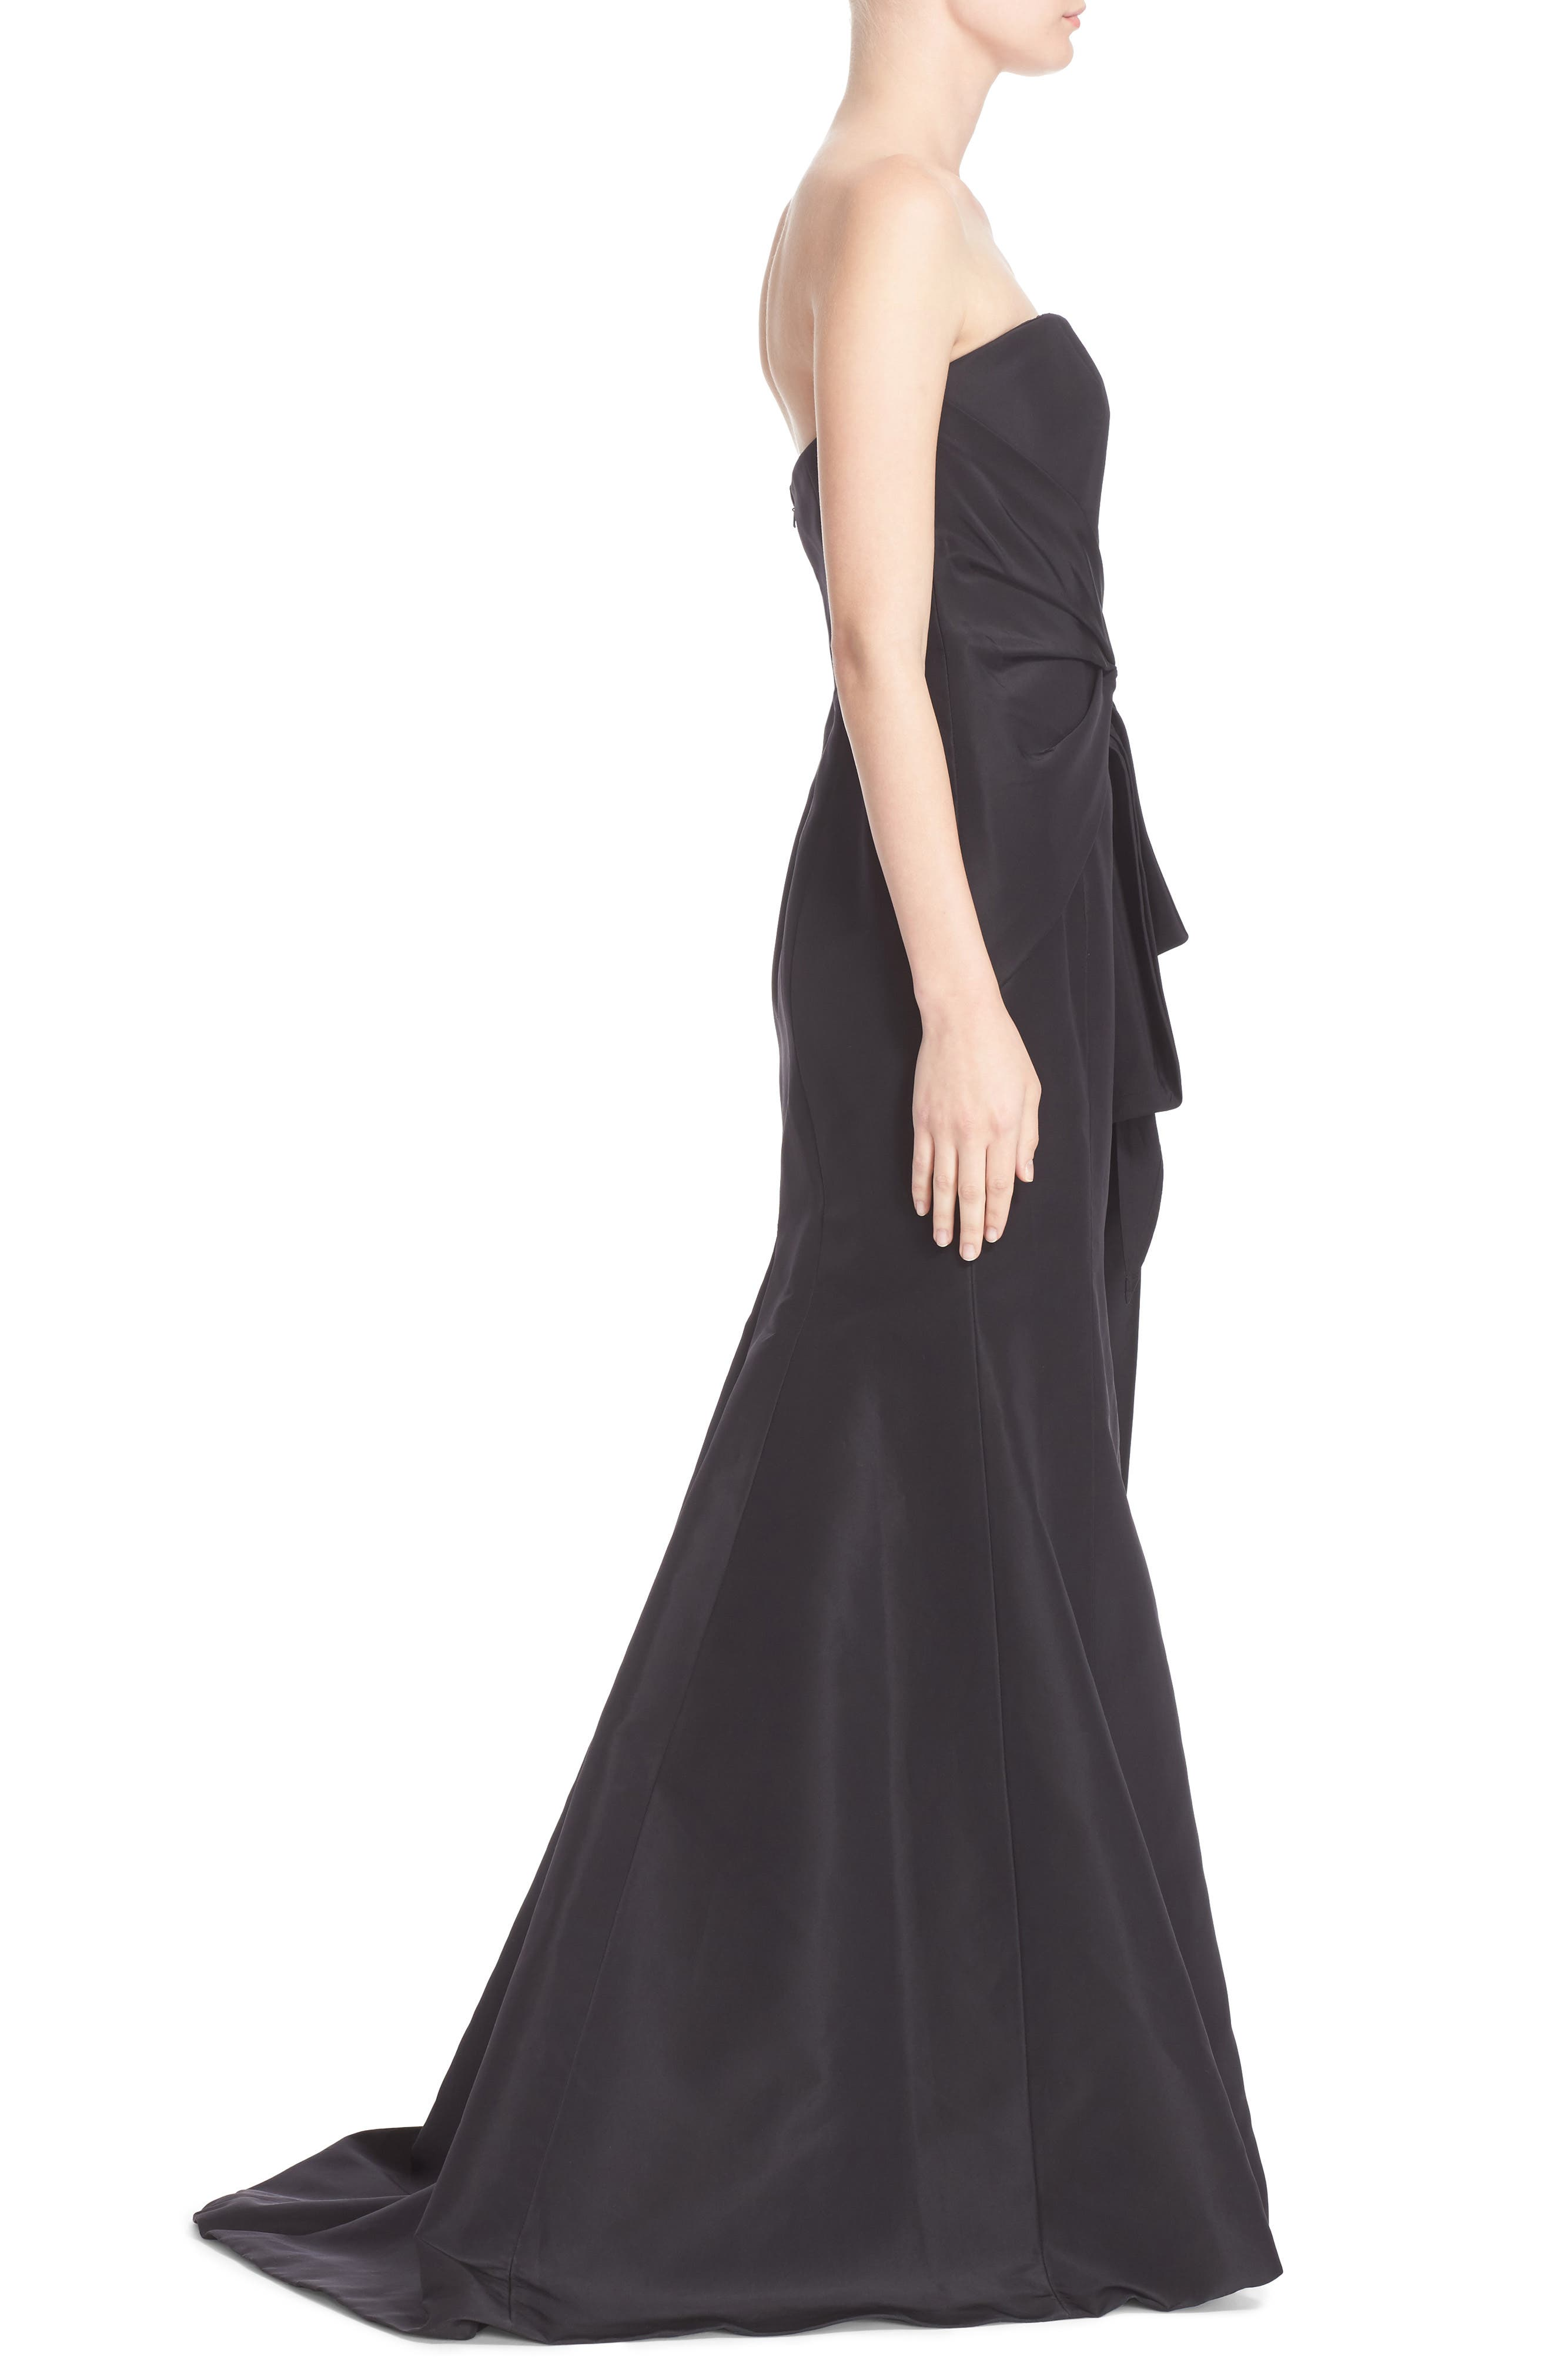 Alternate Image 3  - Carolina Herrera Bow Detail Strapless Silk Faille Gown (Nordstrom Exclusive)